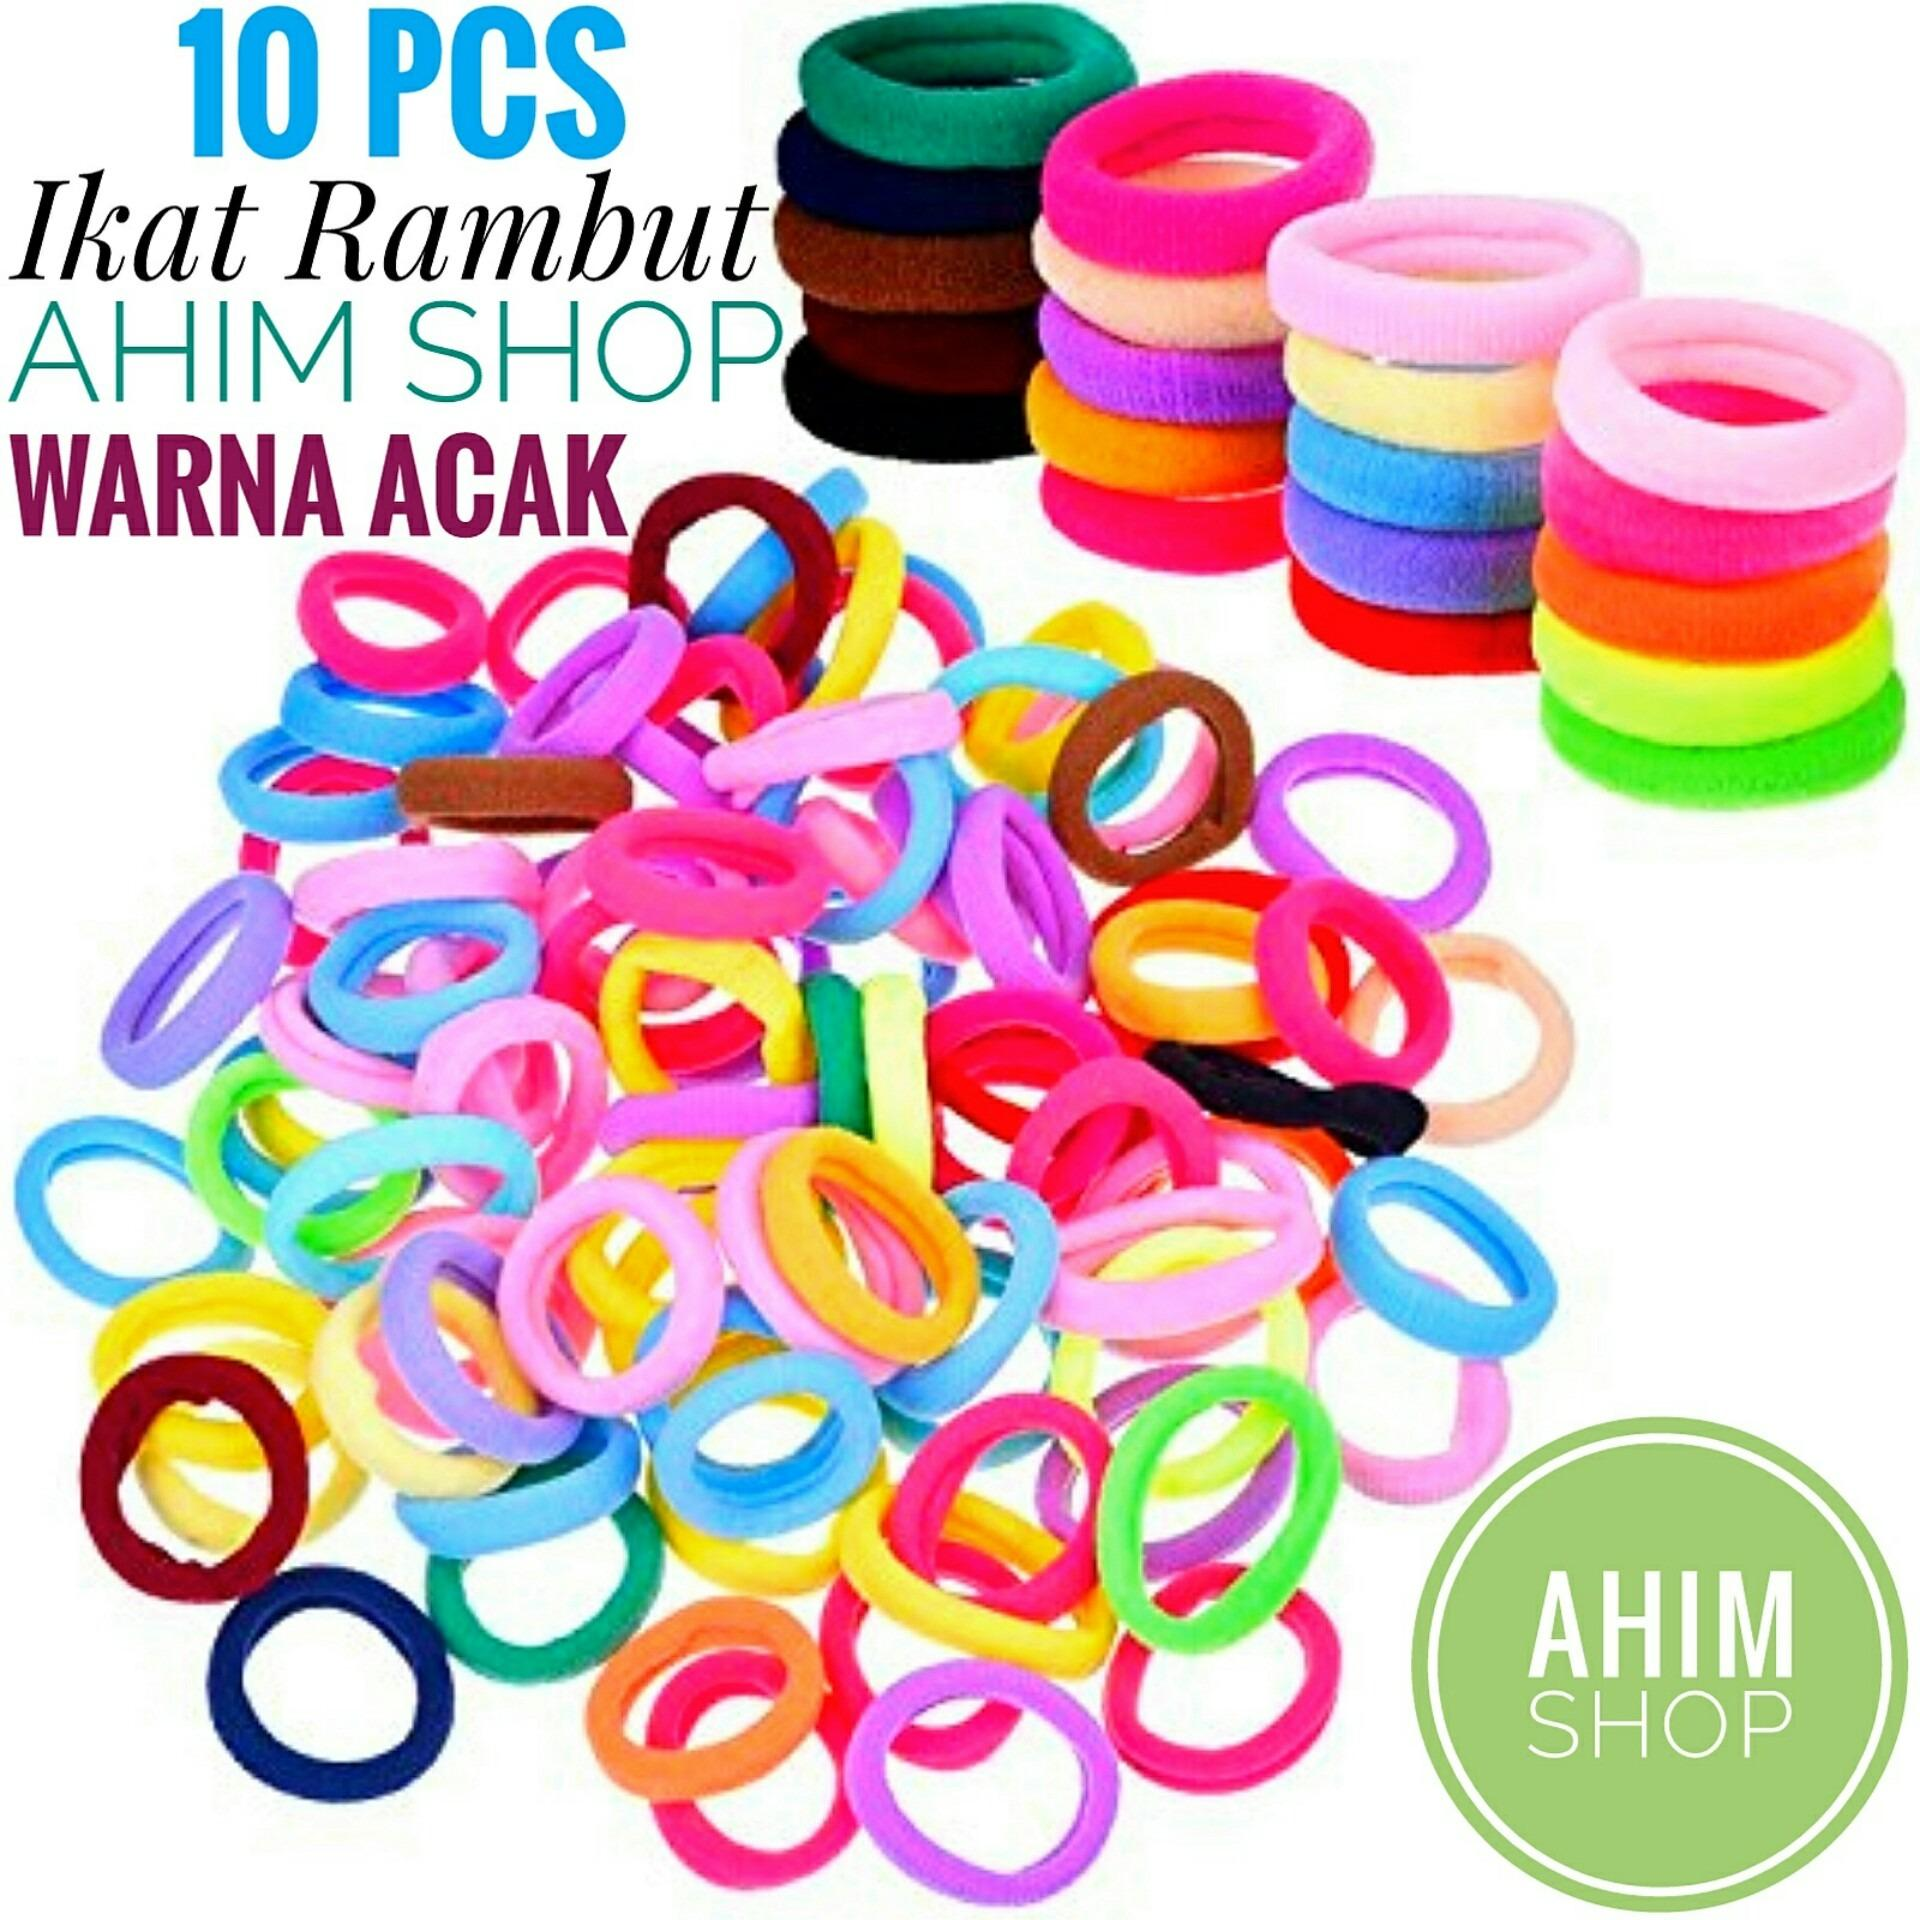 Aneka Aksesoris Rambut Jedai Ahim Shop 10 Pcs Ikat Polos Warna Warni Acak Random Color